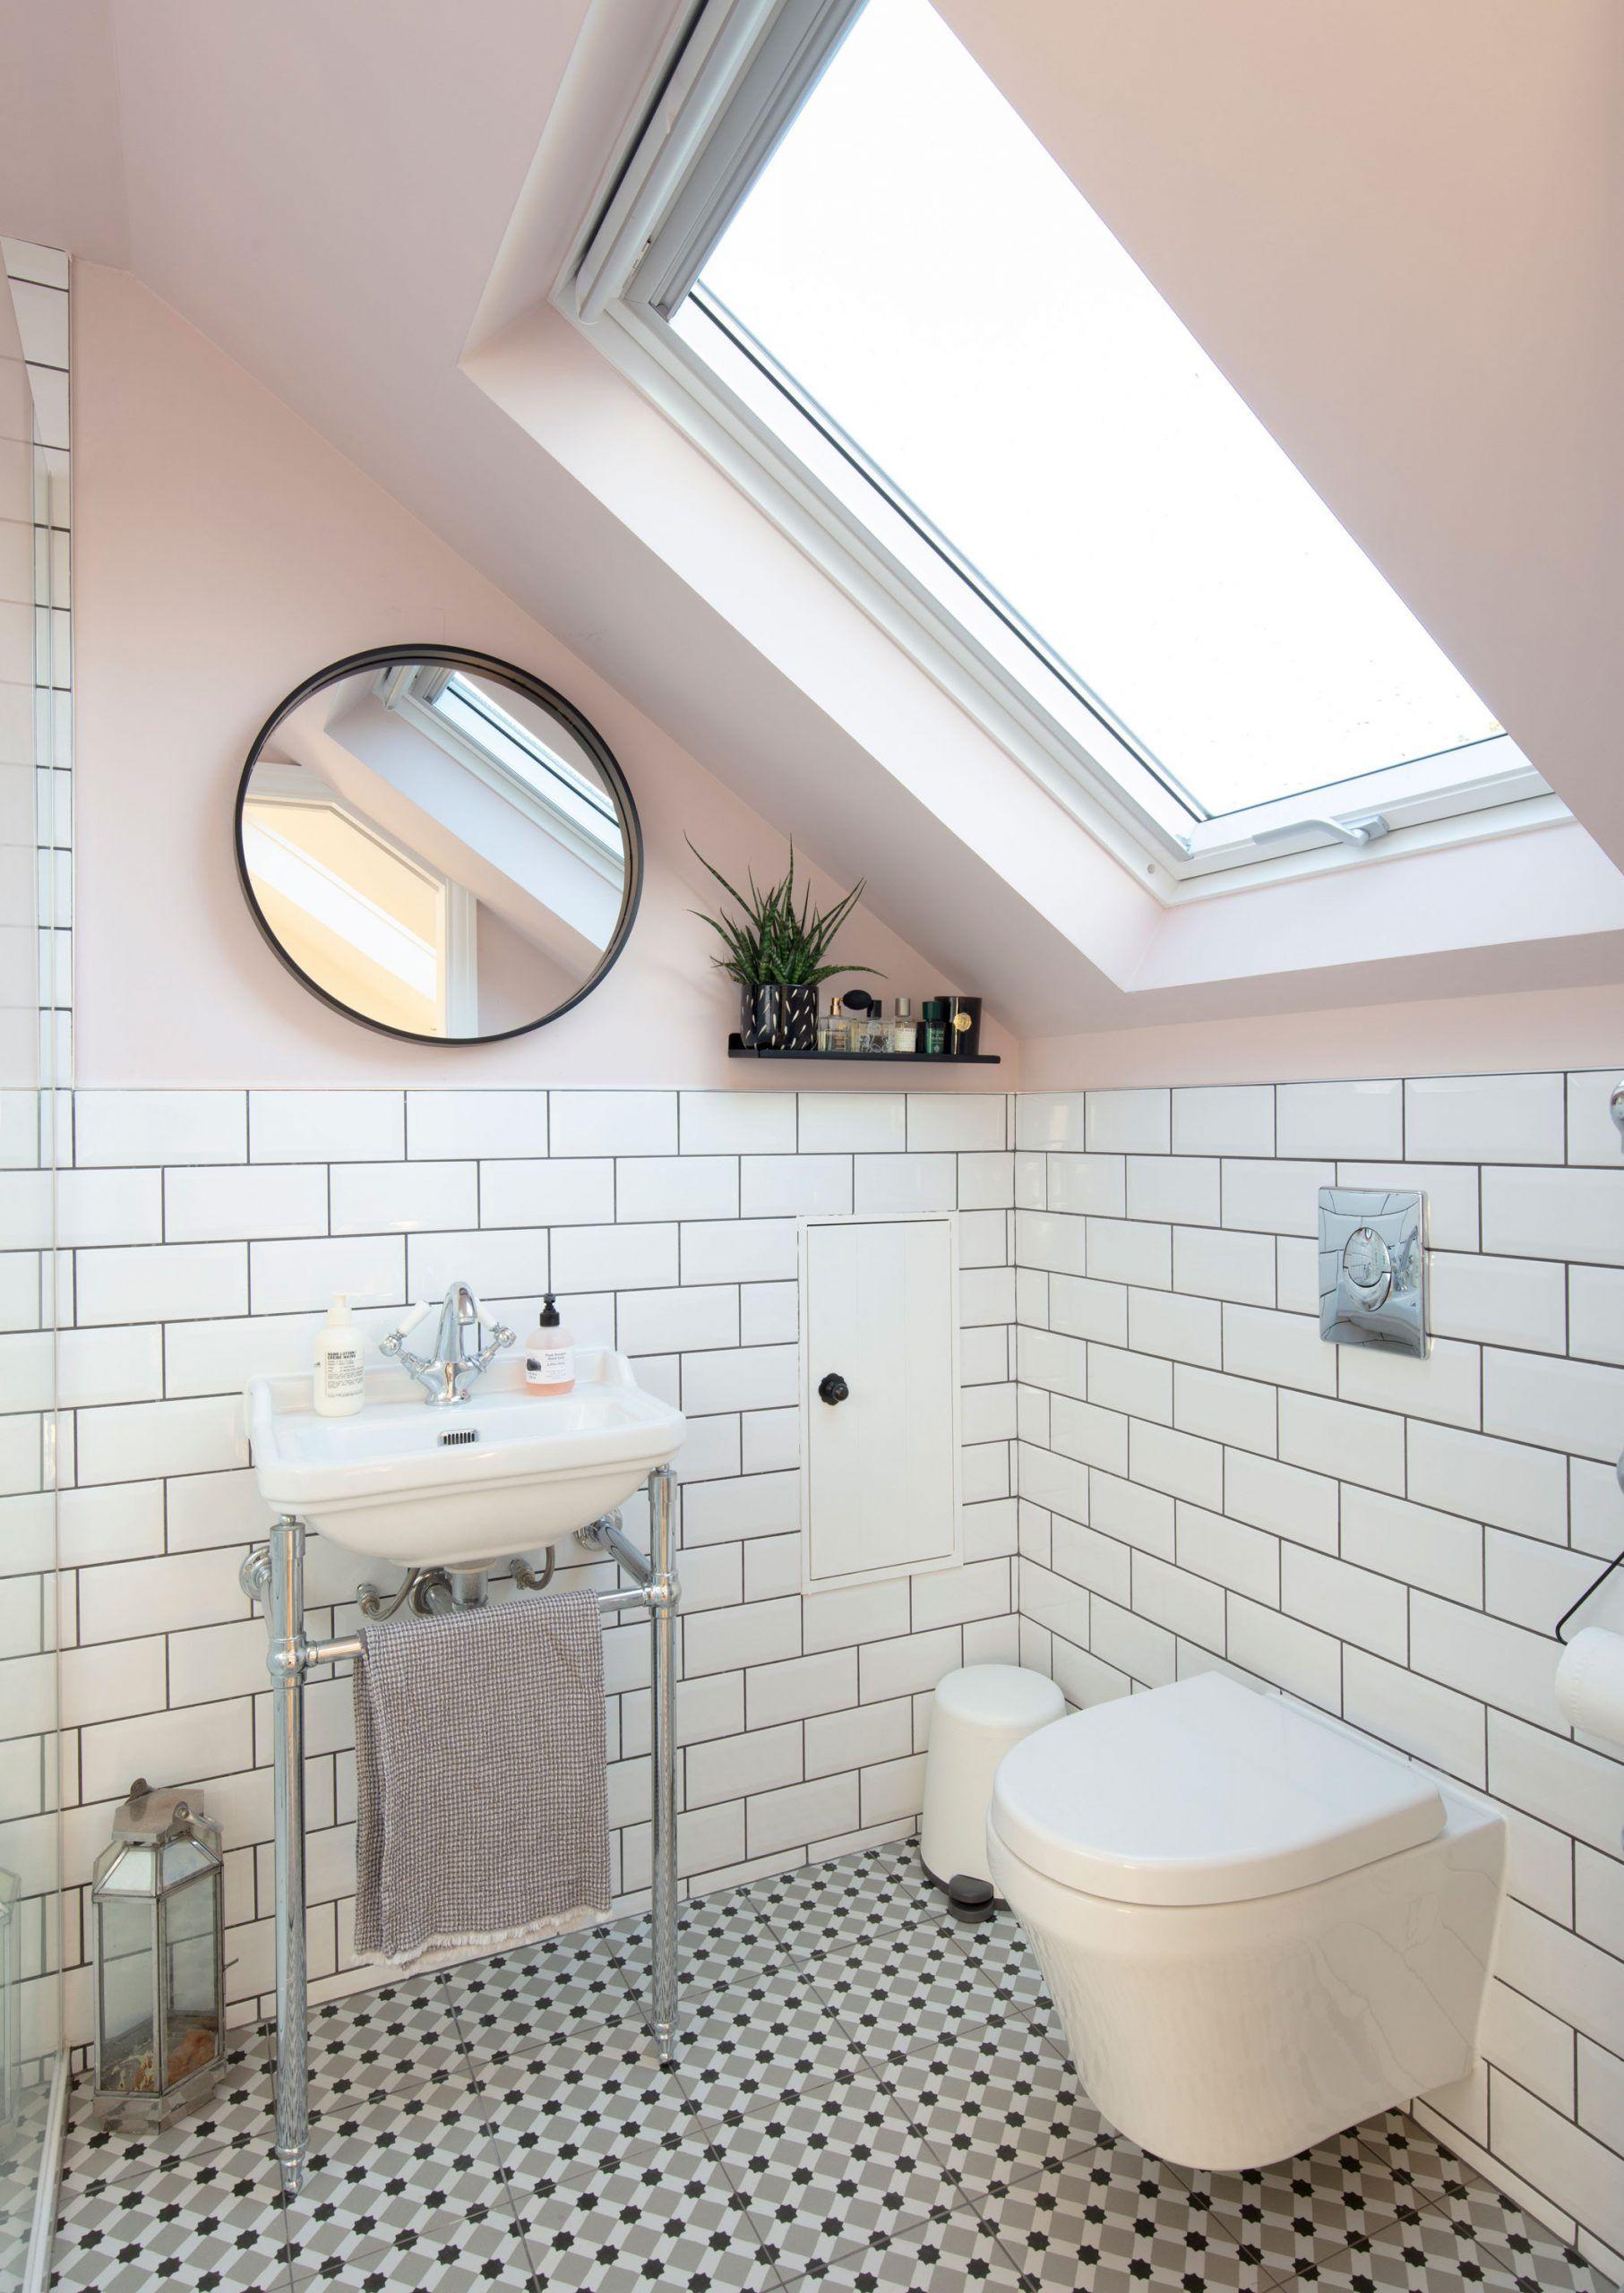 Small Bathroom Ideas Photo Gallery Small Bathroom Design Ideas 16 Ways To Make A Small In 2020 Small Space Bathroom Small Bathroom Design Small Bathroom